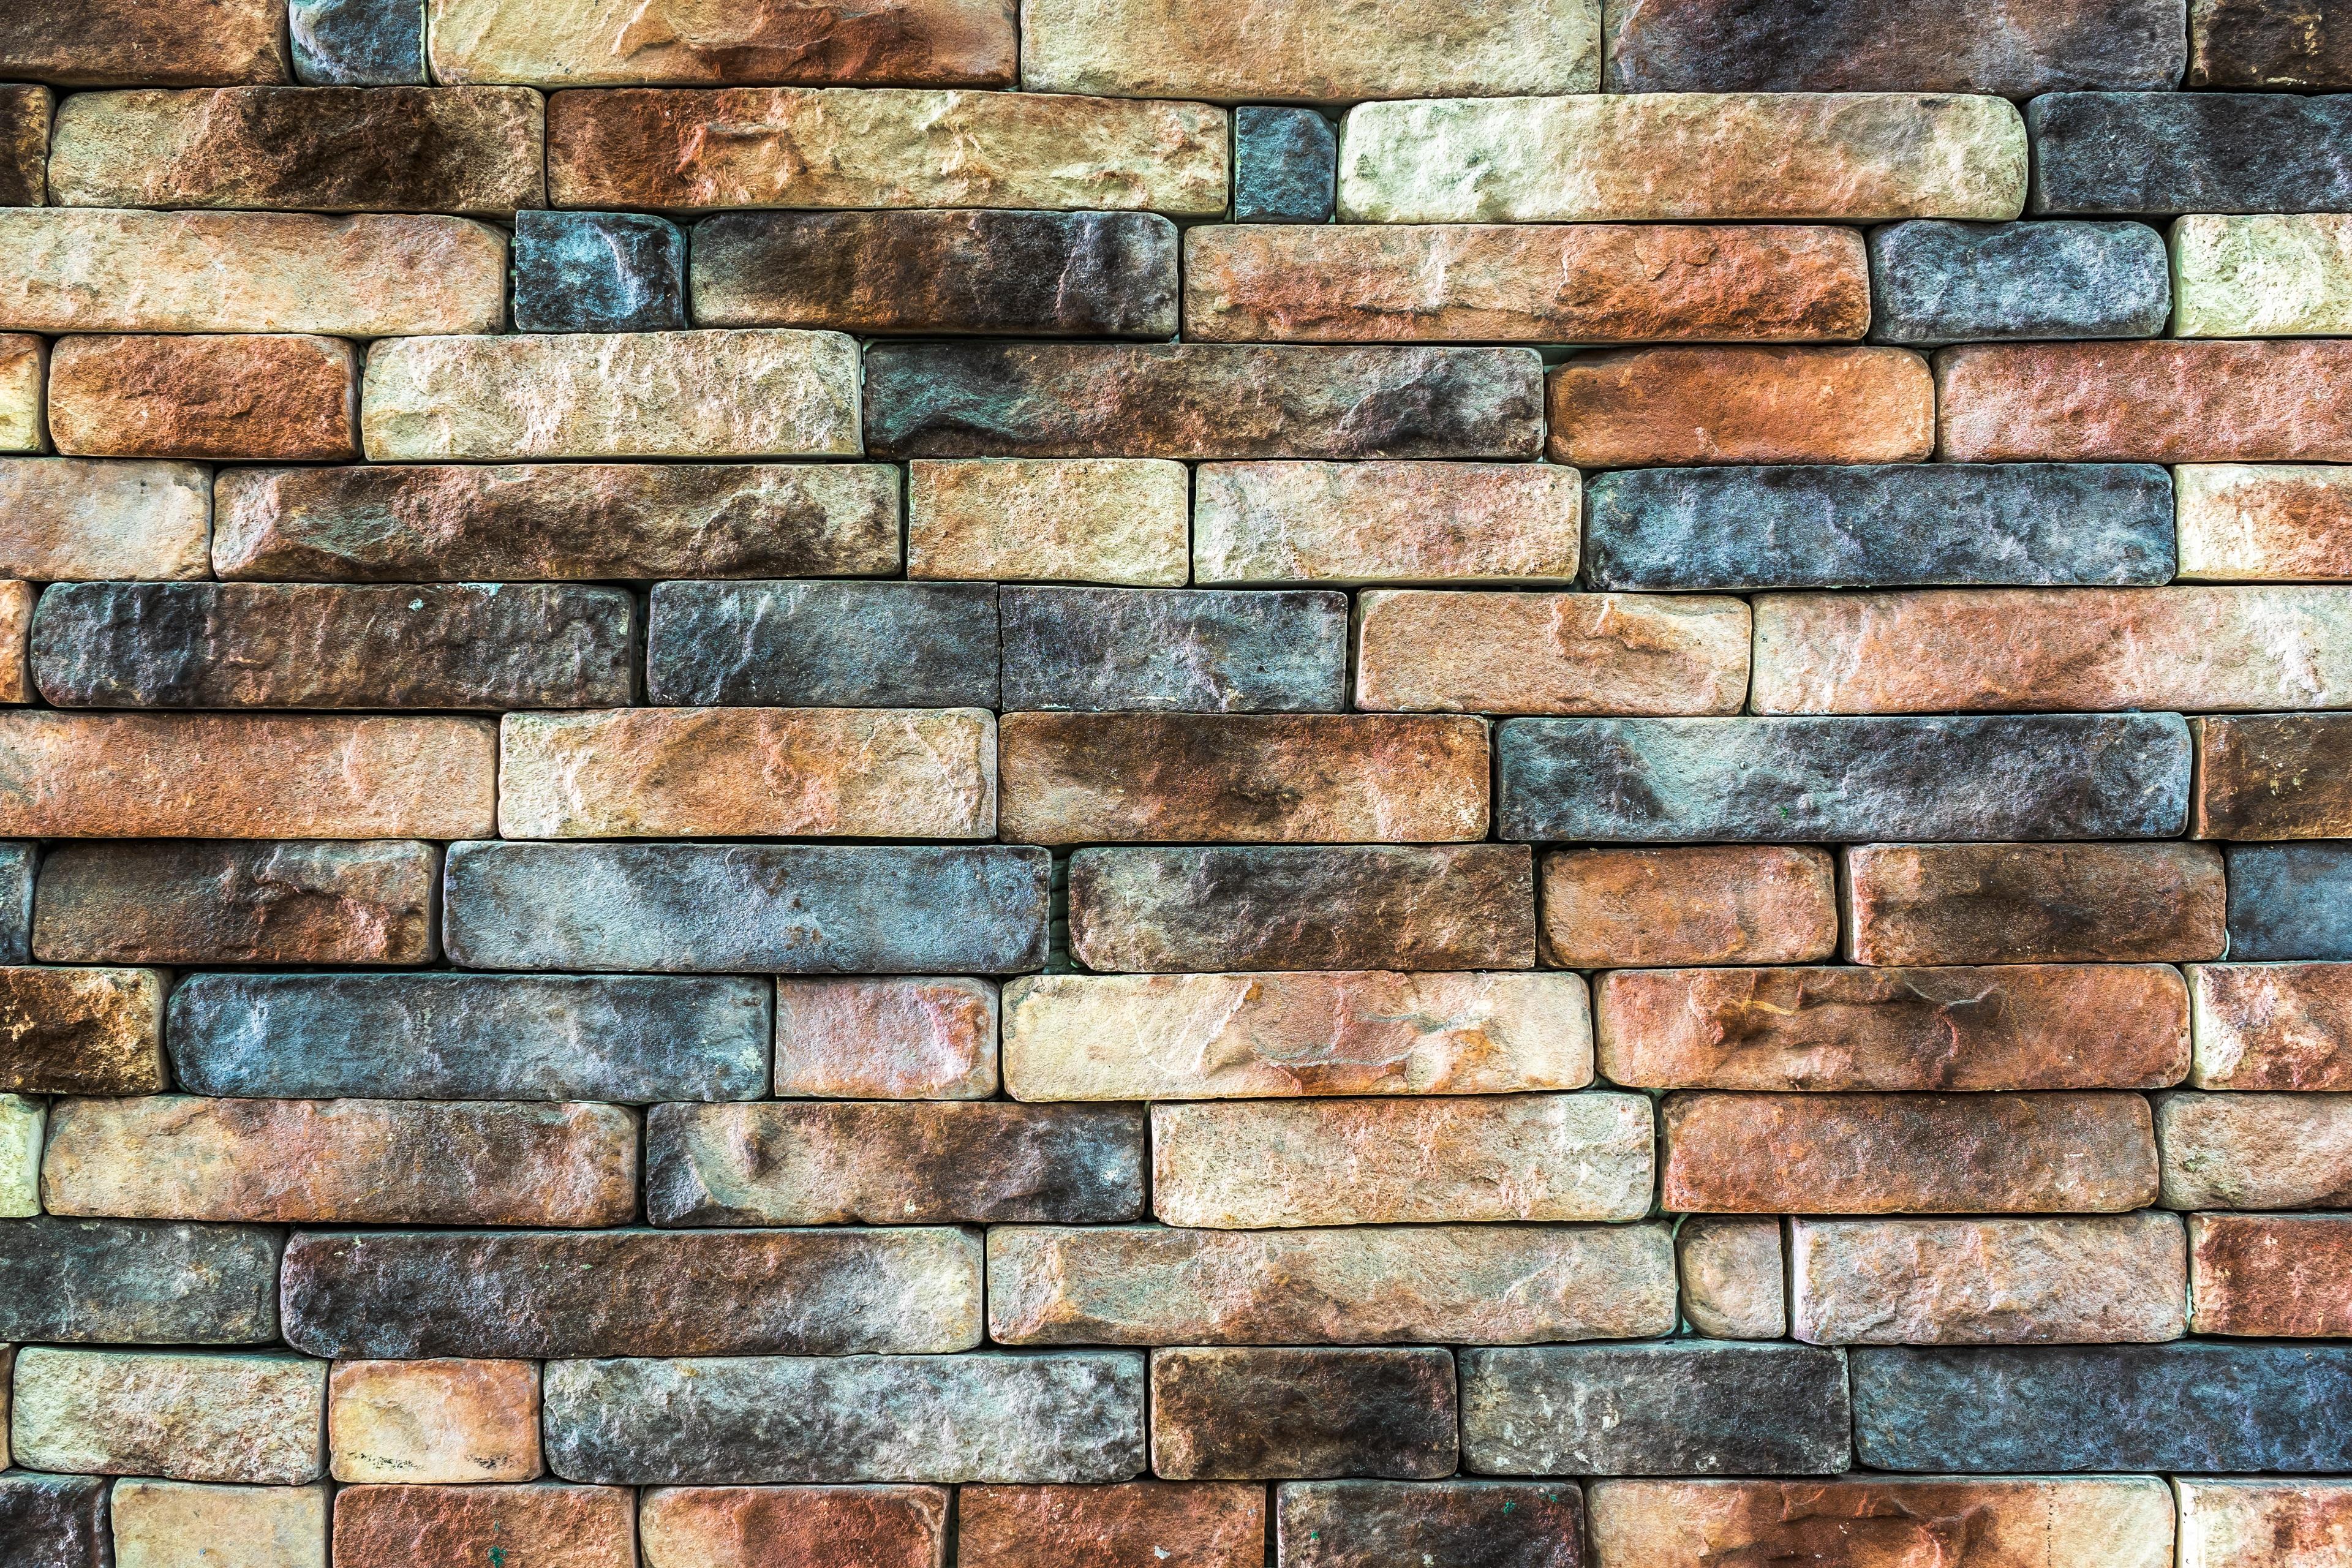 Fotos gratis textura piso interior pared - Pared de piedra interior ...